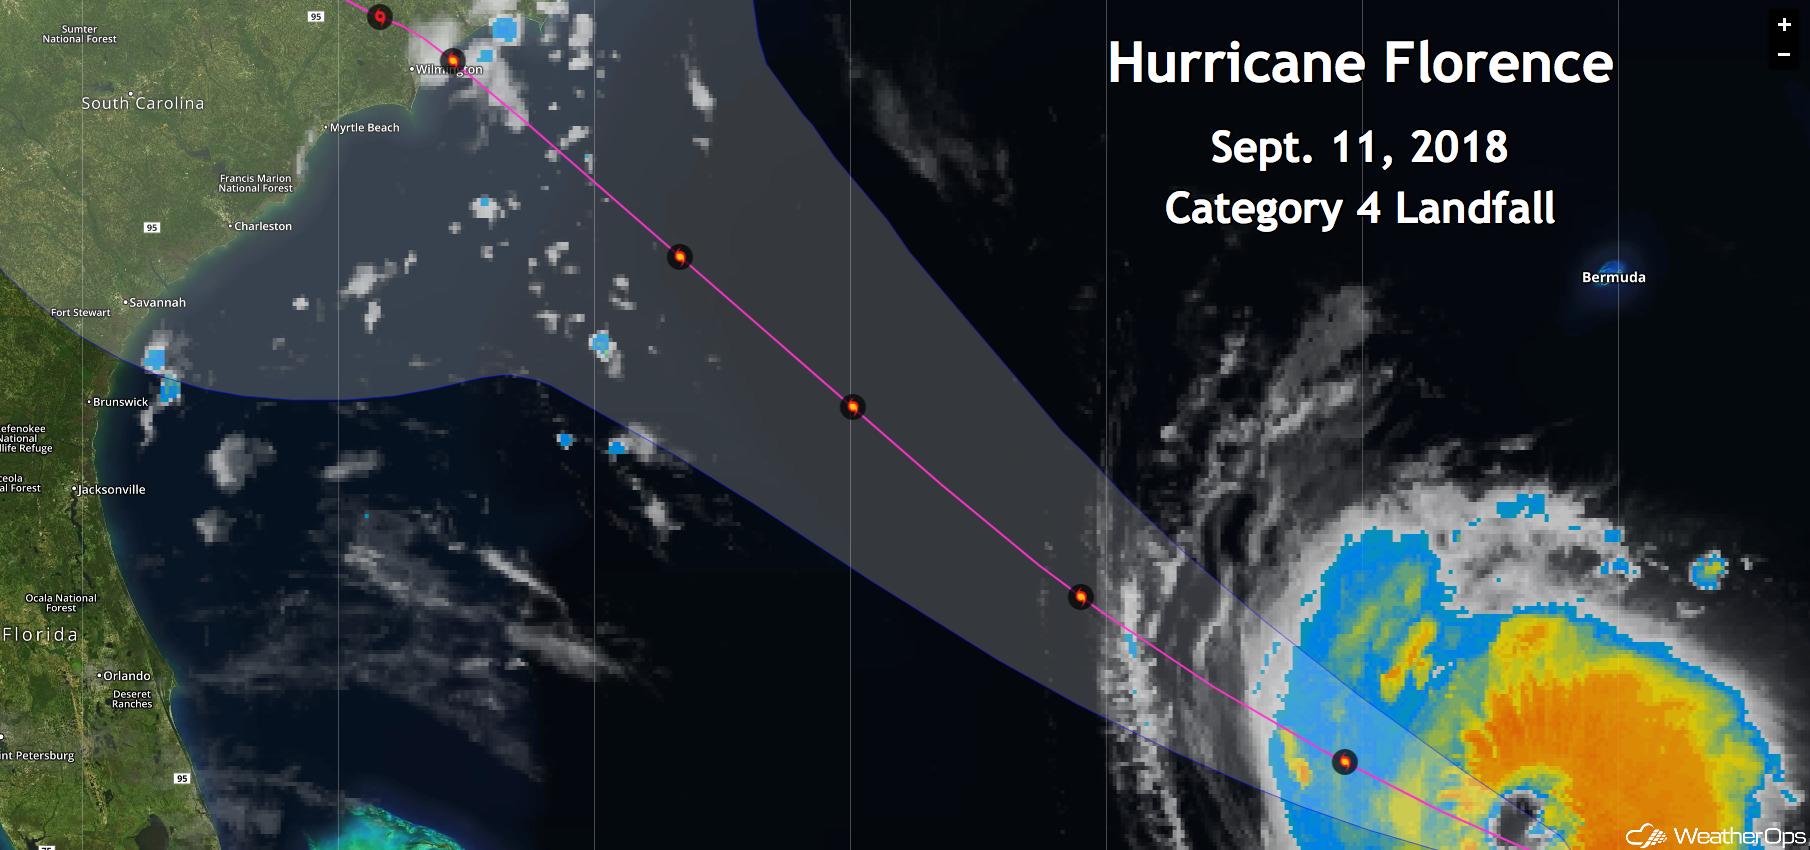 Path of Hurricane Florence